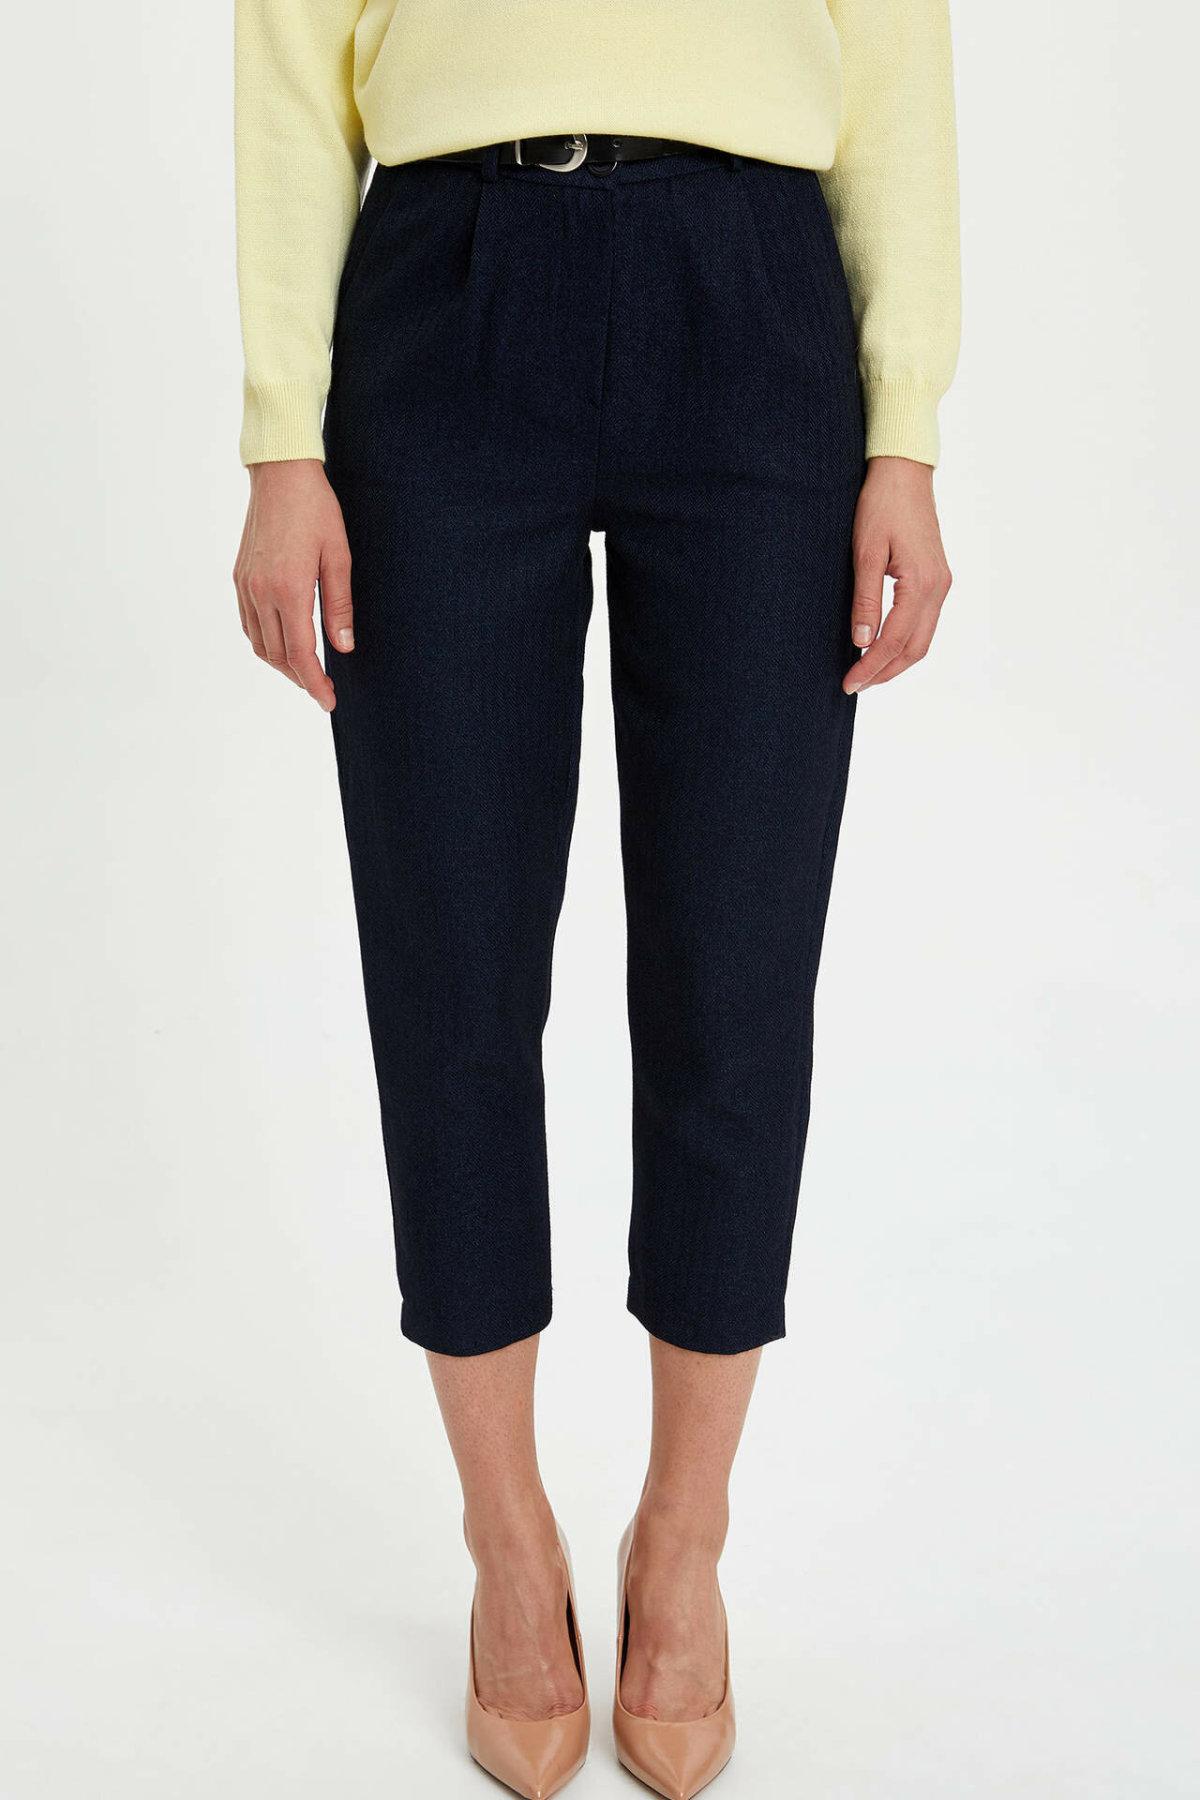 DeFacto New Woman Fashion Trousers Female Casual Crop Pants Ladies Comfort Turnip Pants High Quality Blue-M8432AZ19AU